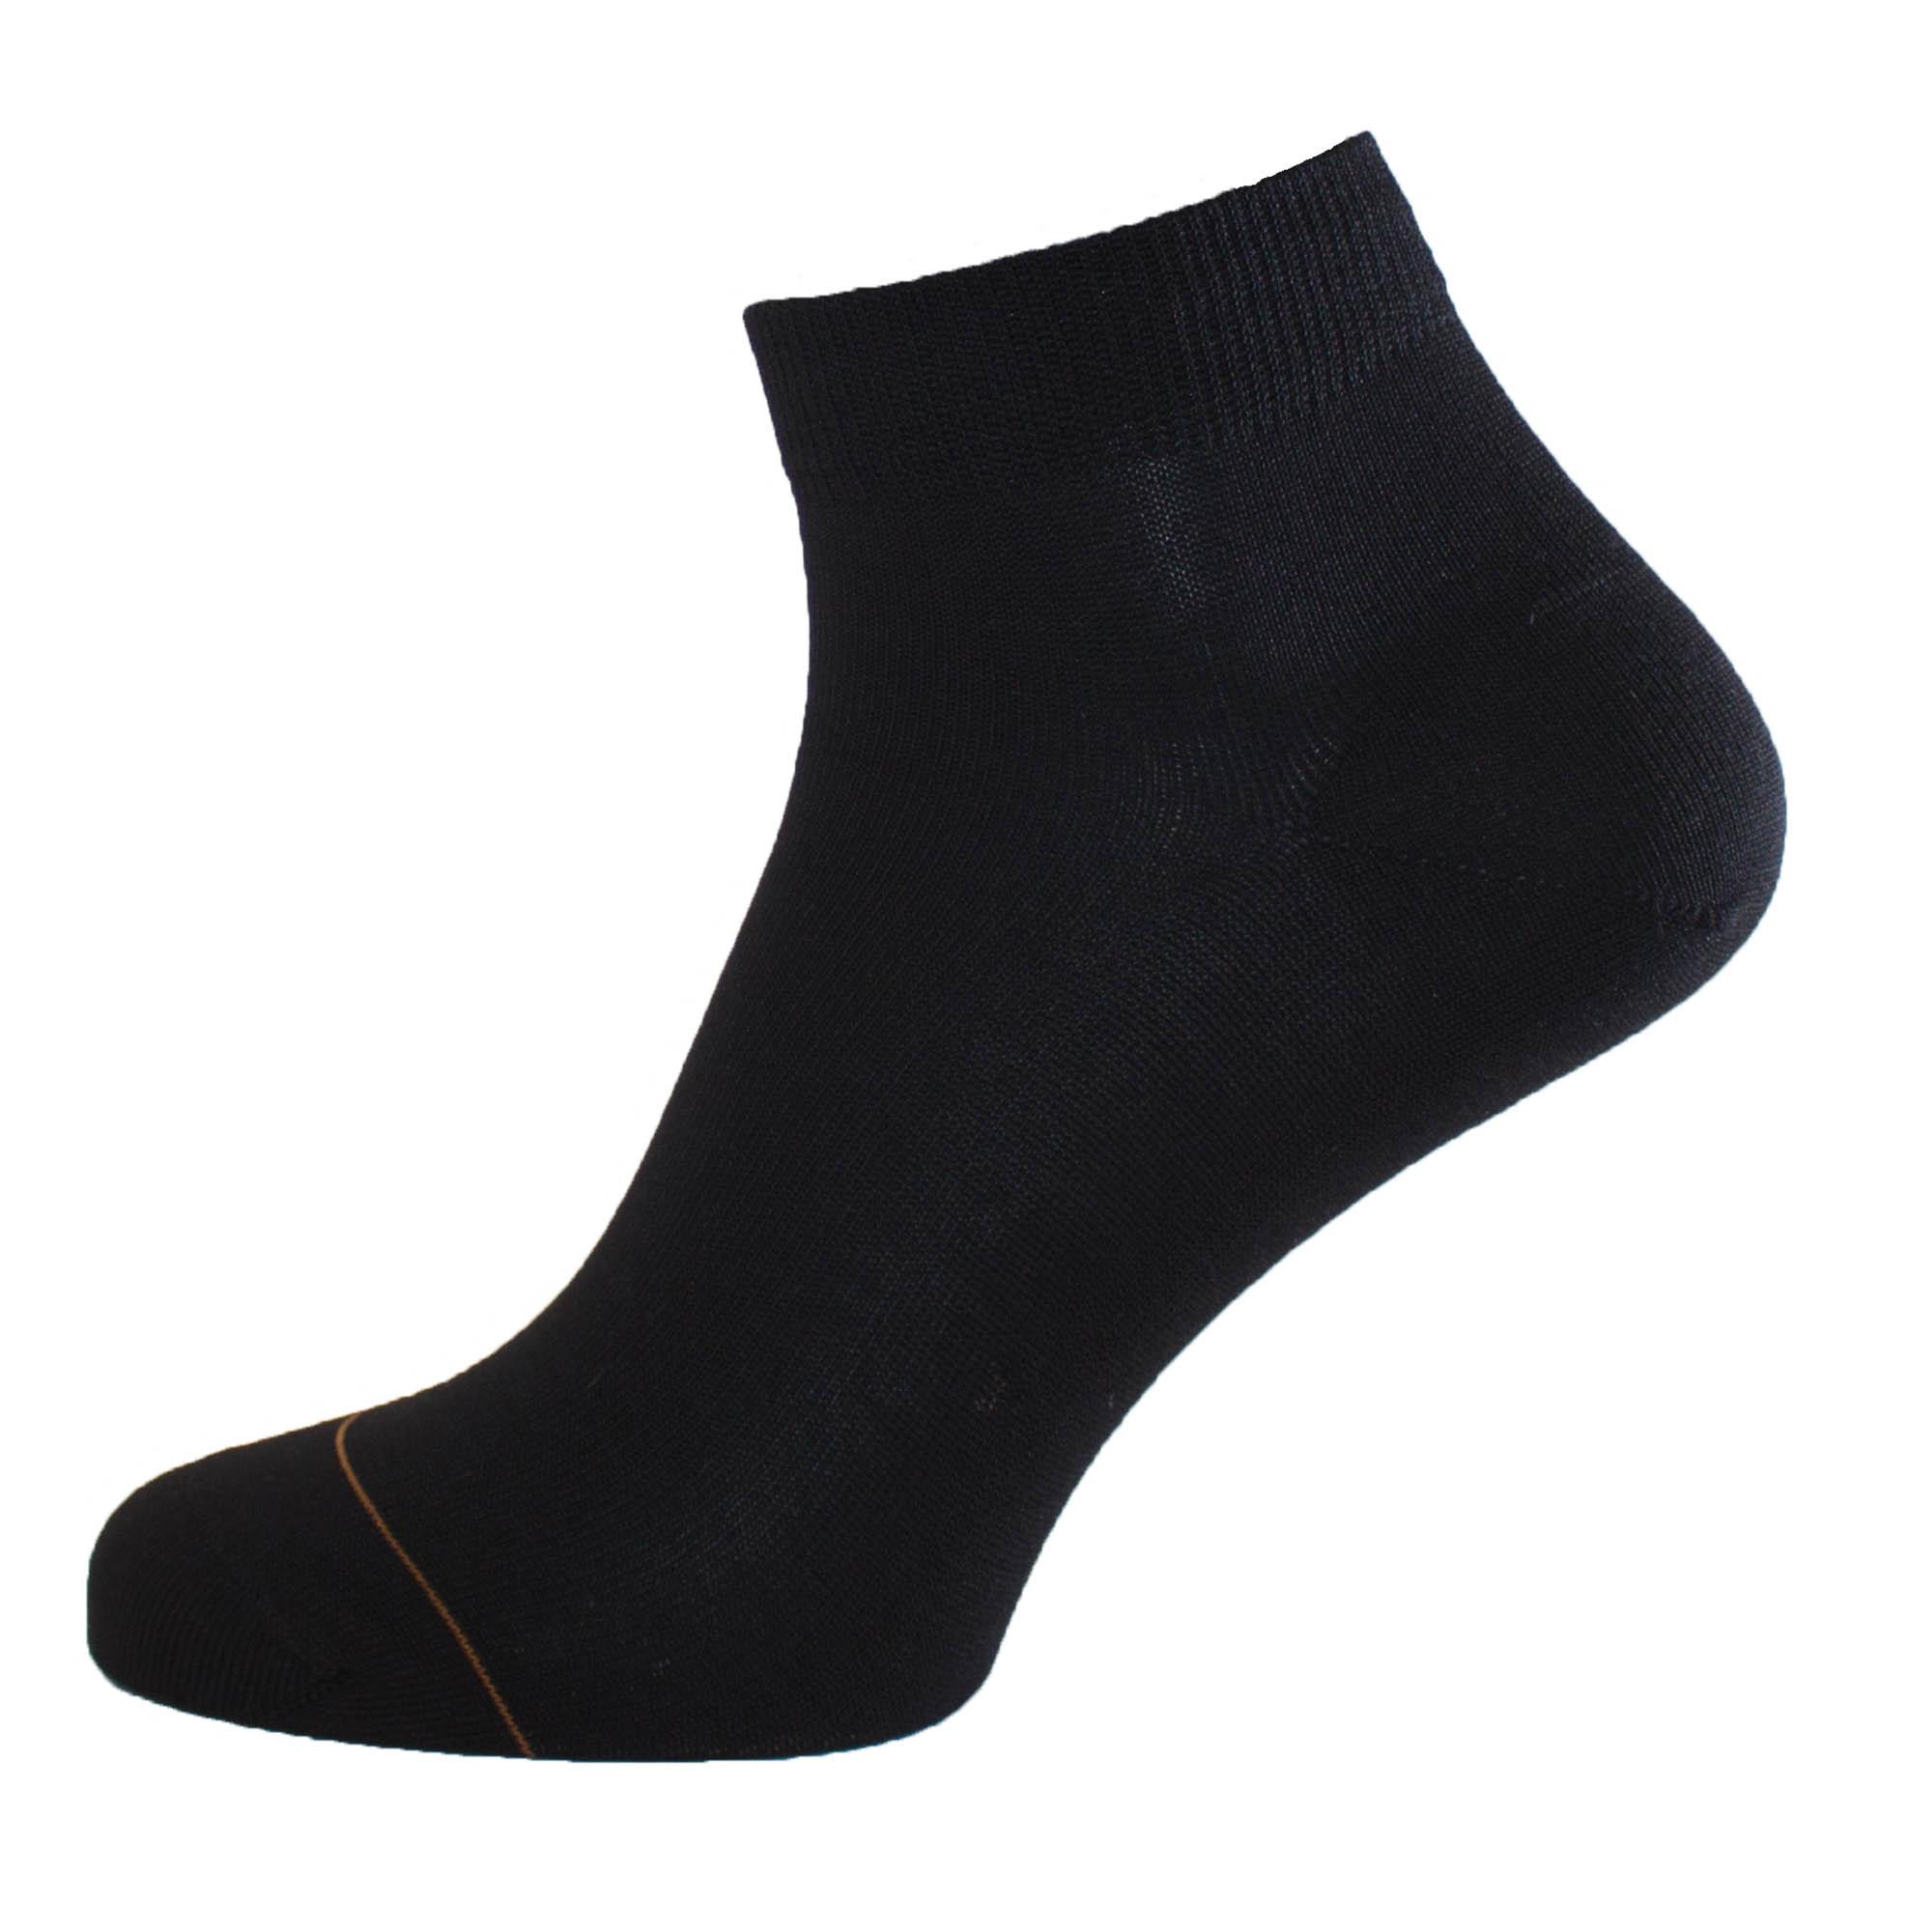 prevents odors black ALBERT KREUZ Men/'s mid calf cotton business socks with silver fiber